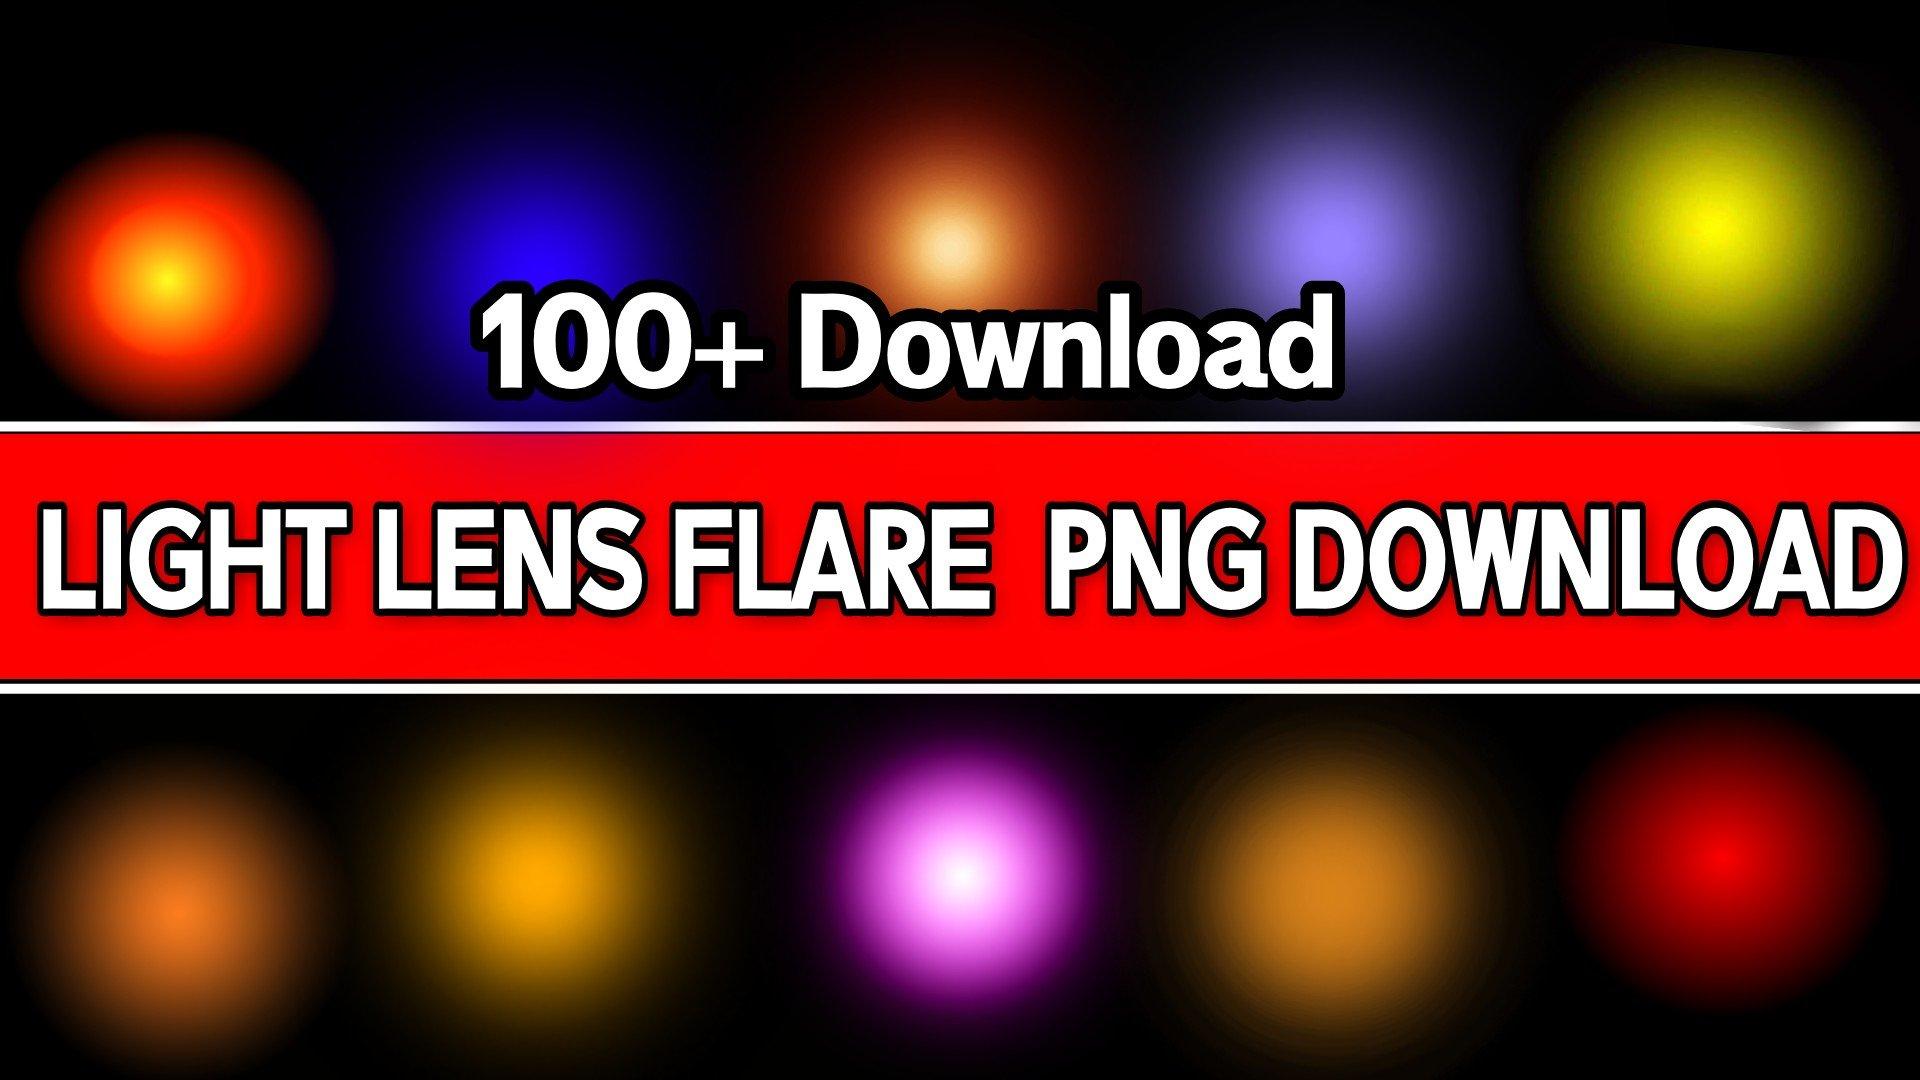 100+ Light Lens Flare Png Download in zip file dwonload free.